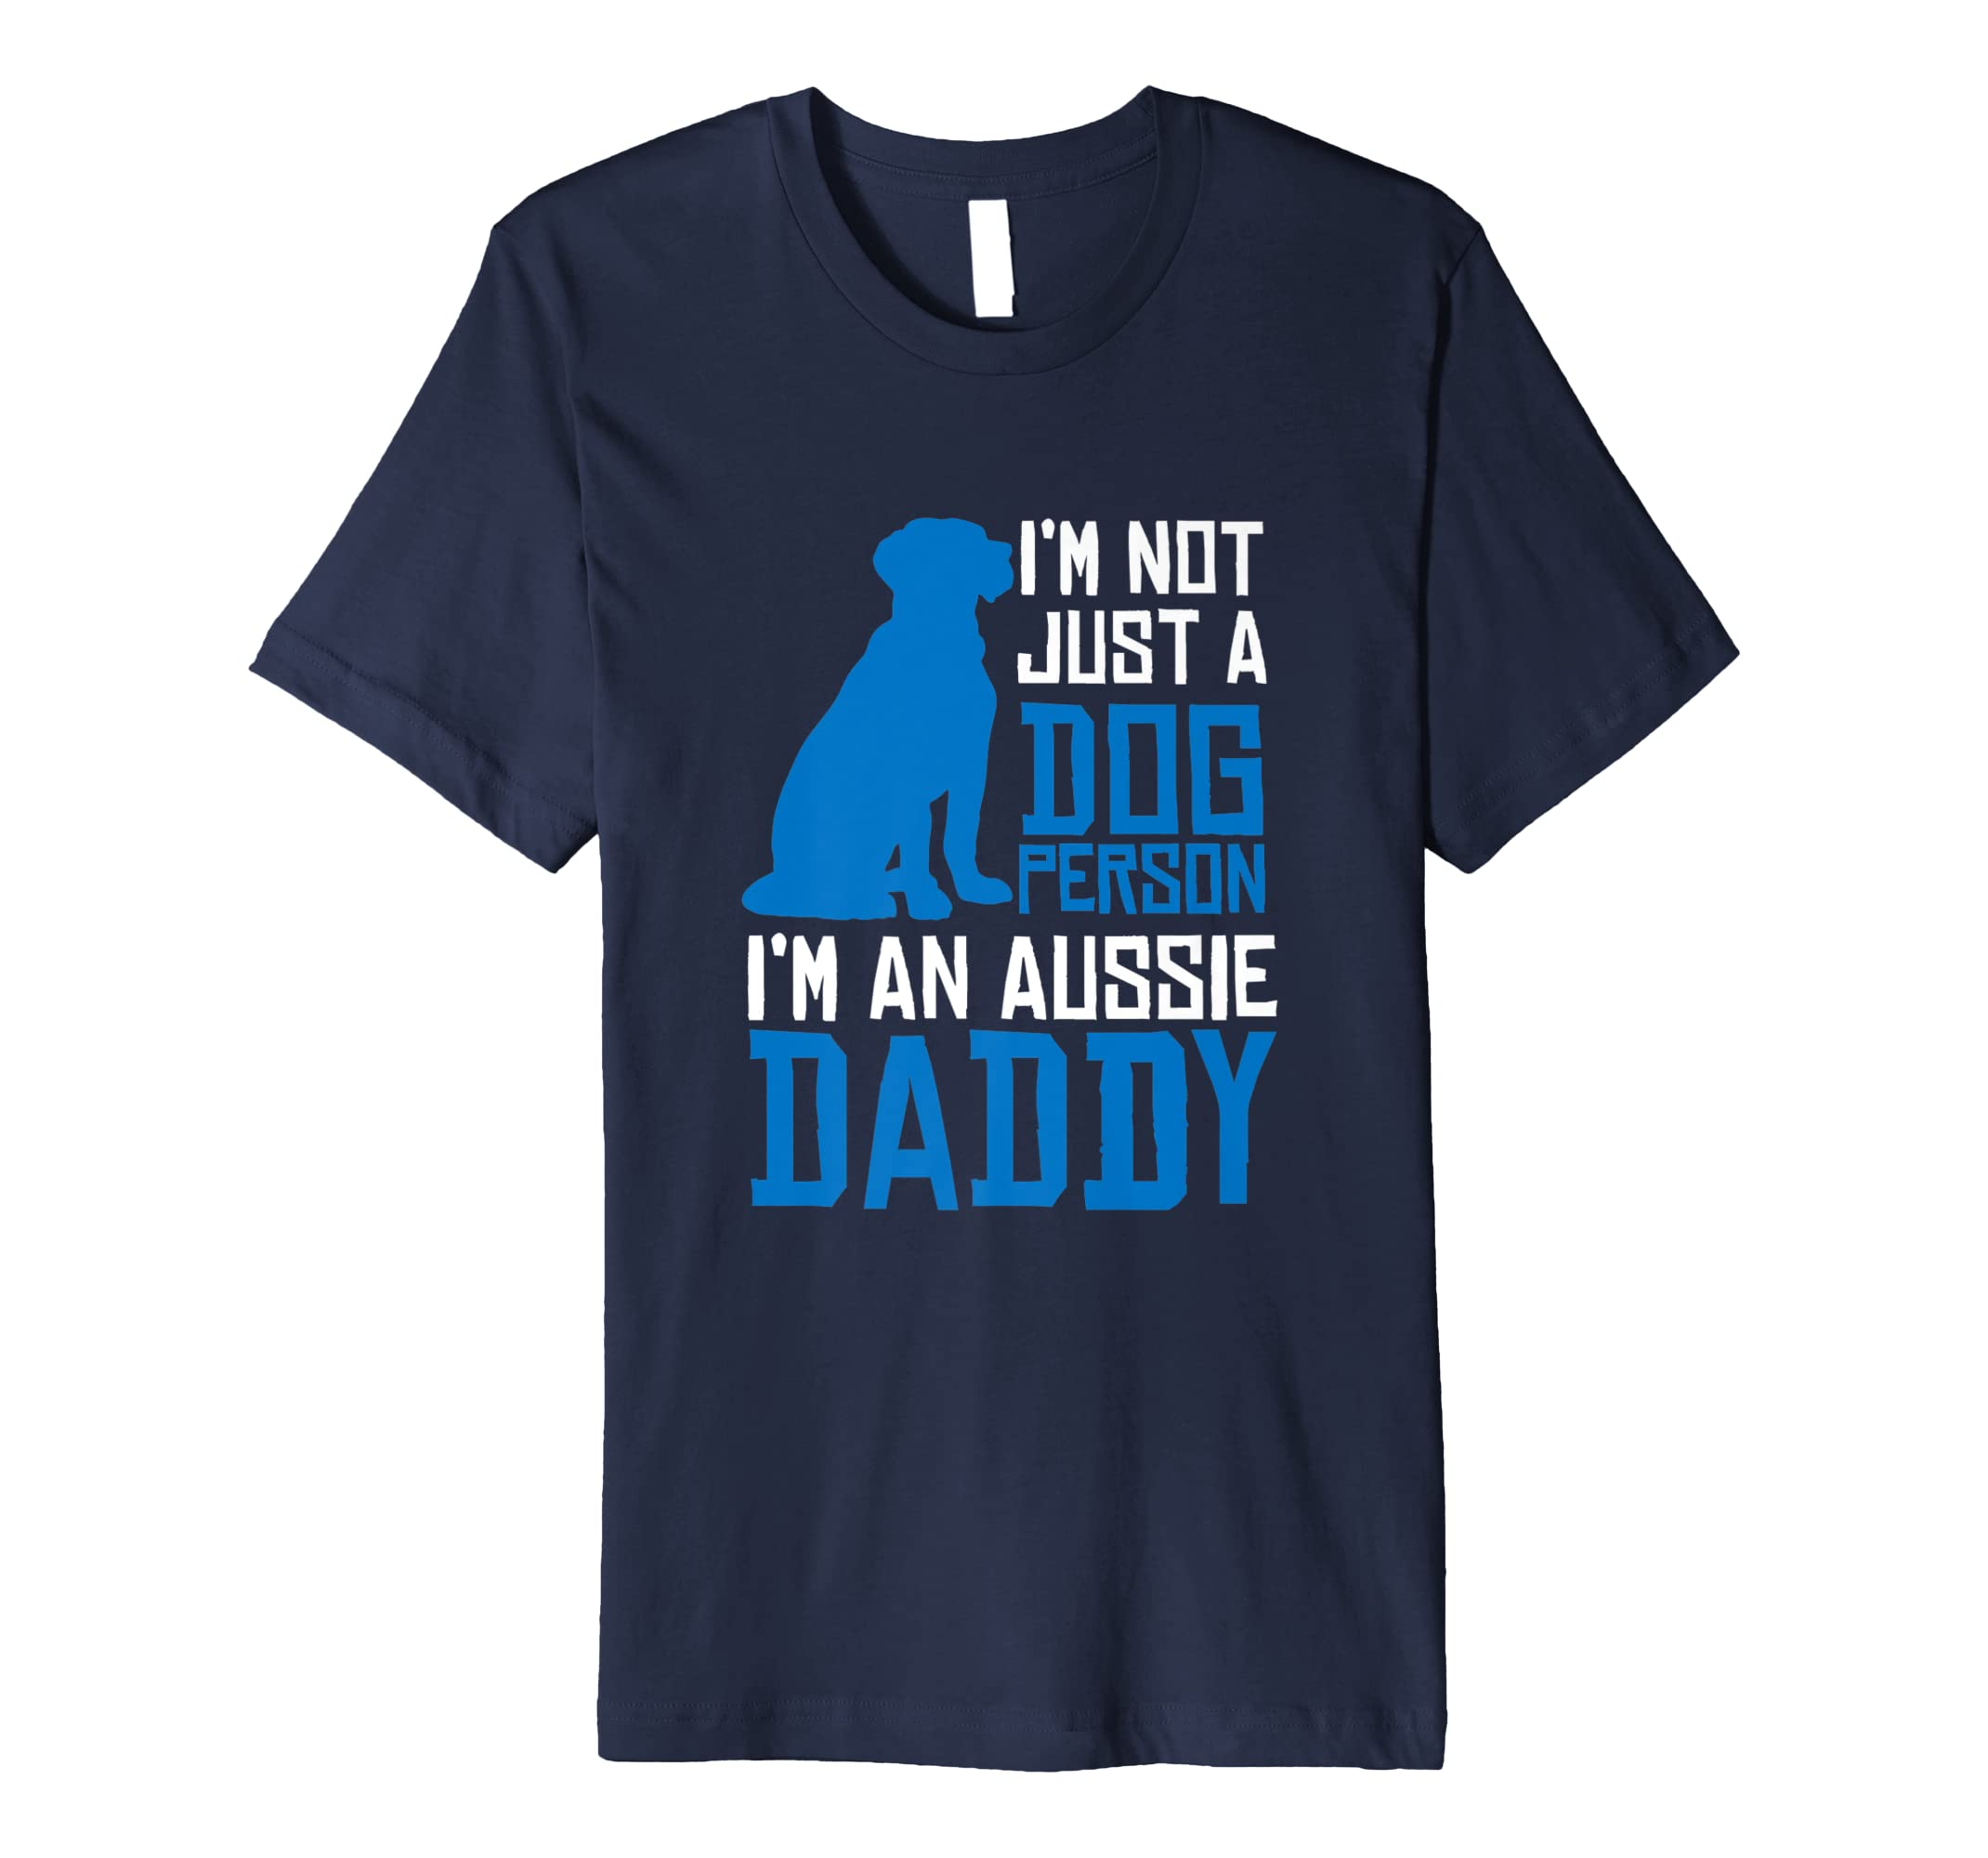 Australian Shepherd Father for Aussie Shepard Gifts-AZP